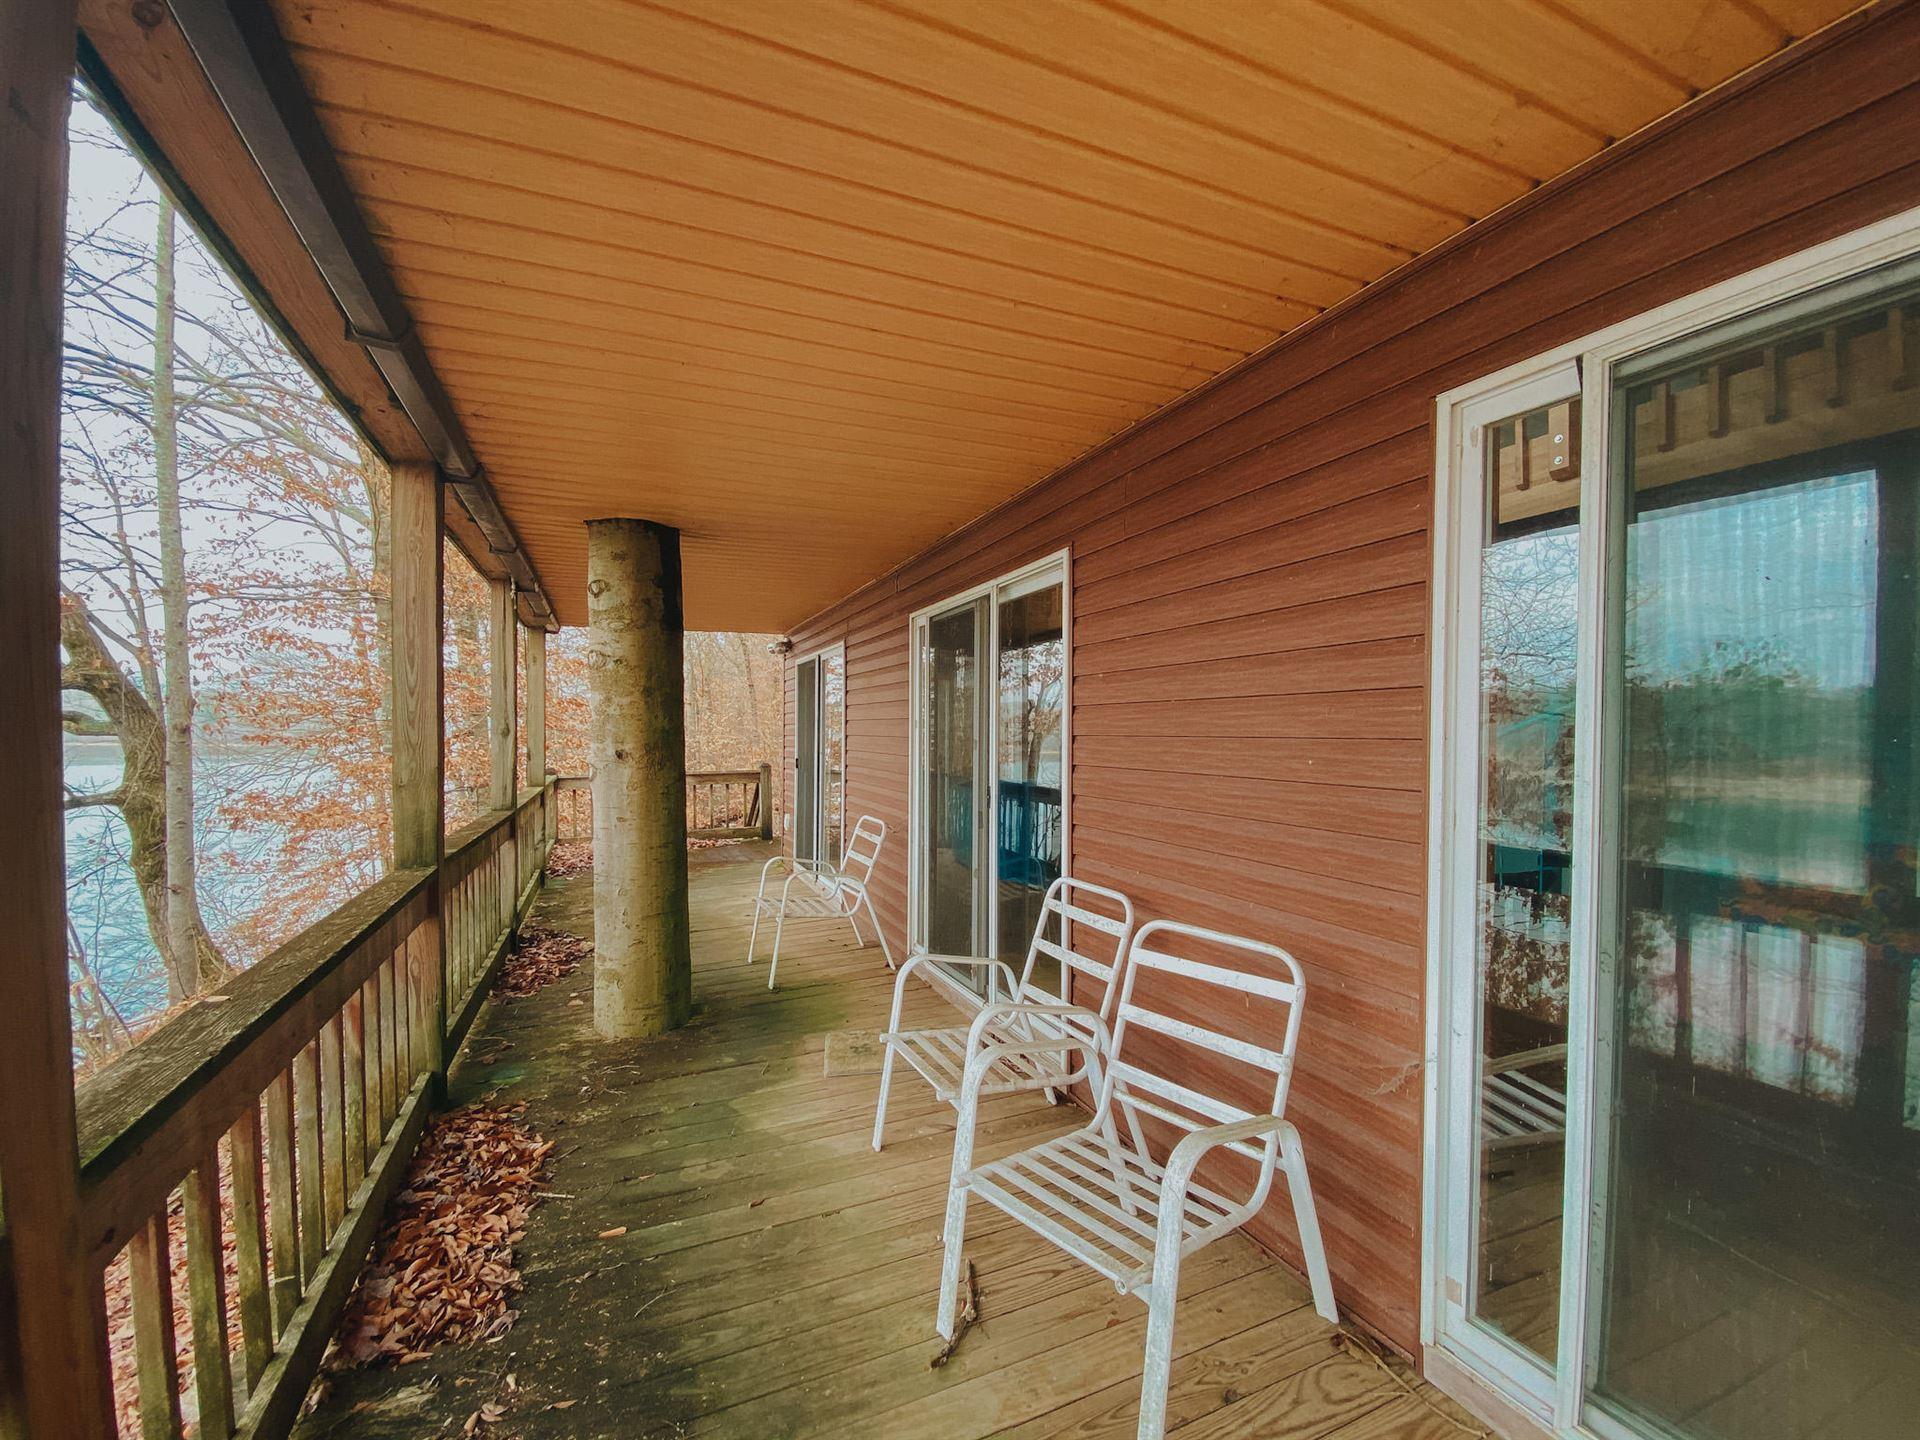 Photo of 198 Peninsula Rd, Rockwood, TN 37854 (MLS # 1140111)